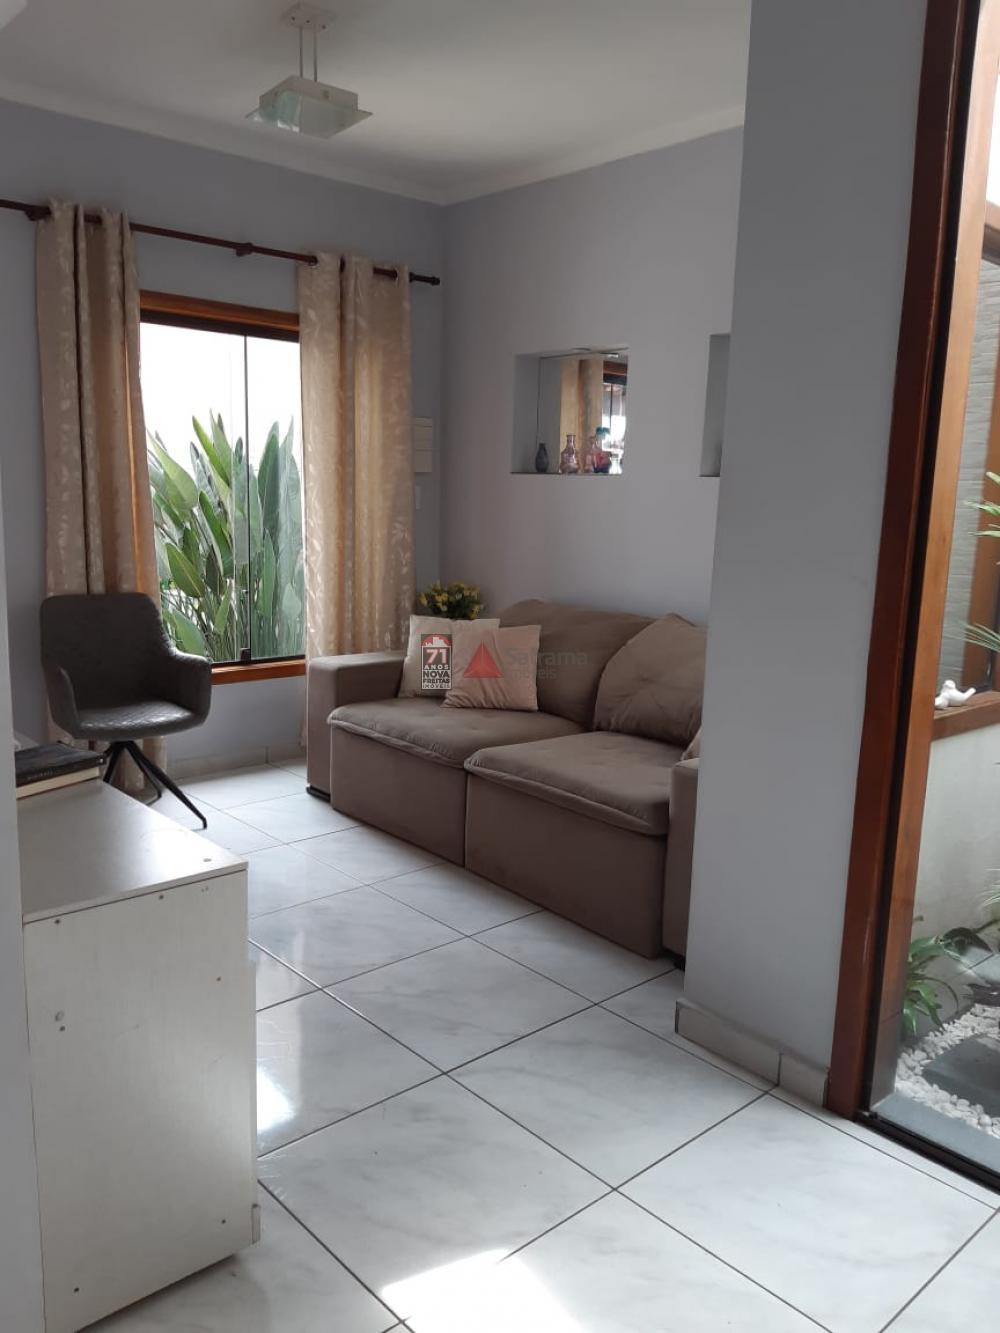 Comprar Casa / Padrão em Pindamonhangaba R$ 350.000,00 - Foto 3